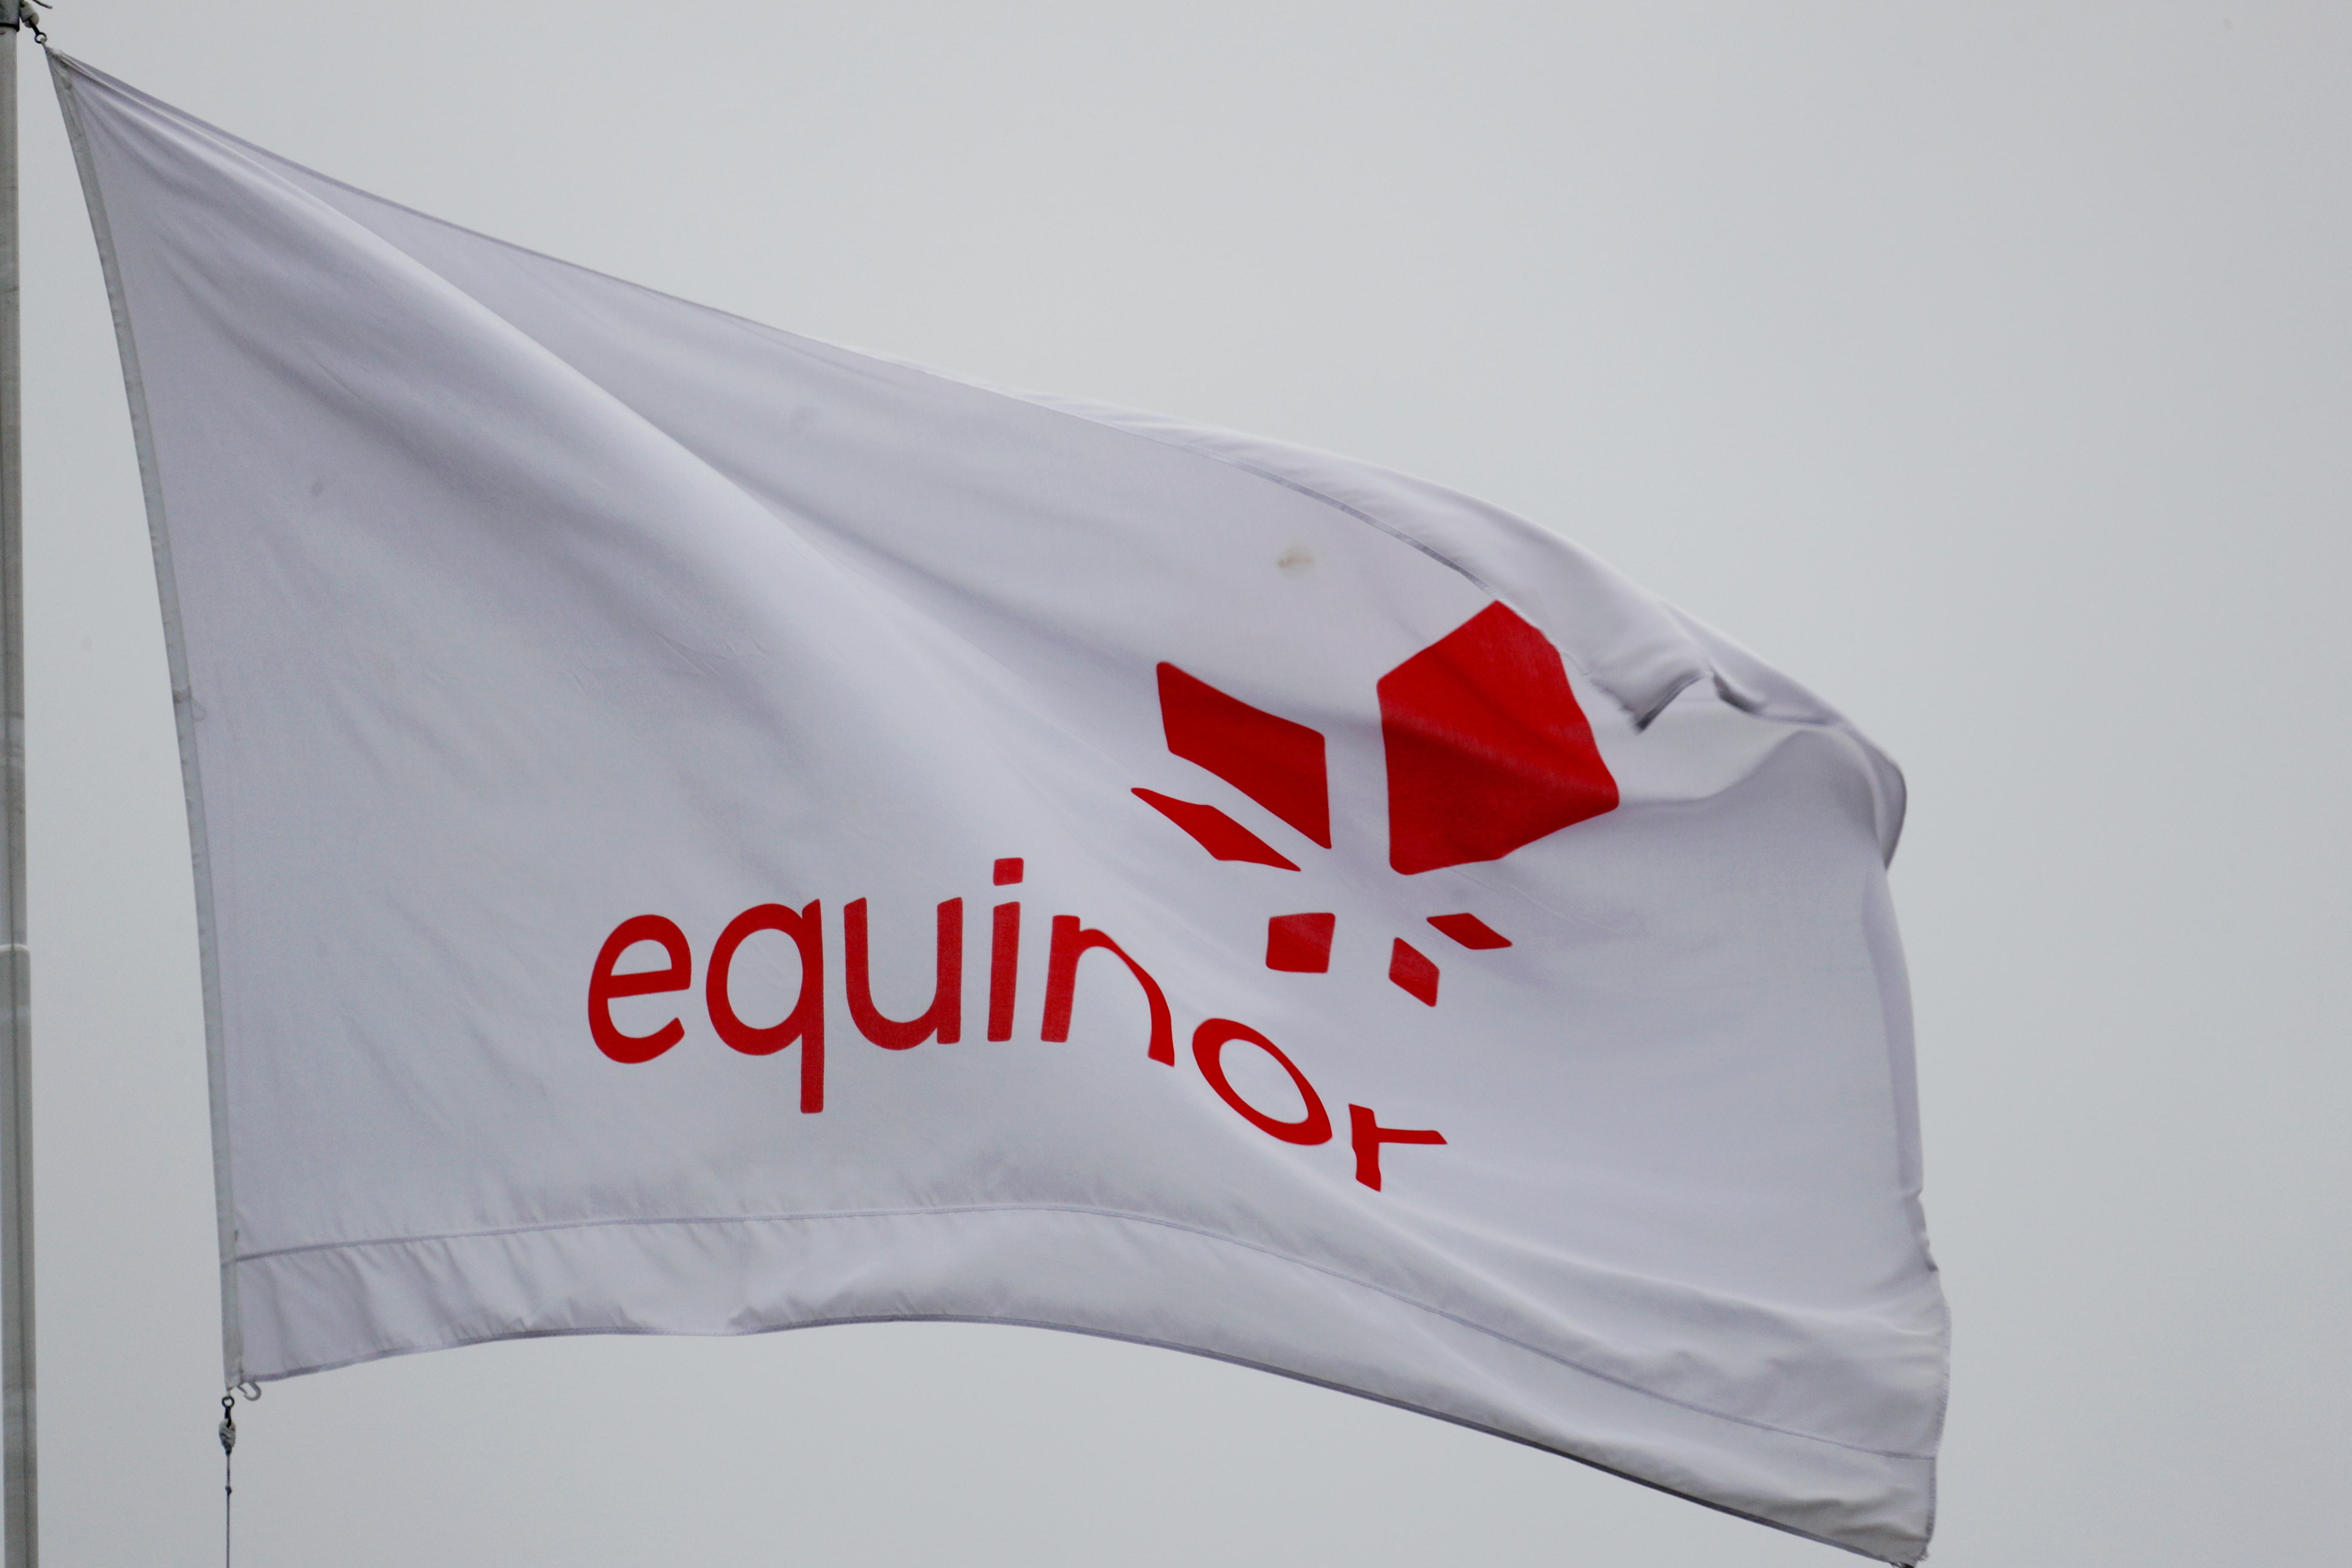 Equinor's flag in Stavanger, Norway December 5, 2019. REUTERS/Ints Kalnins